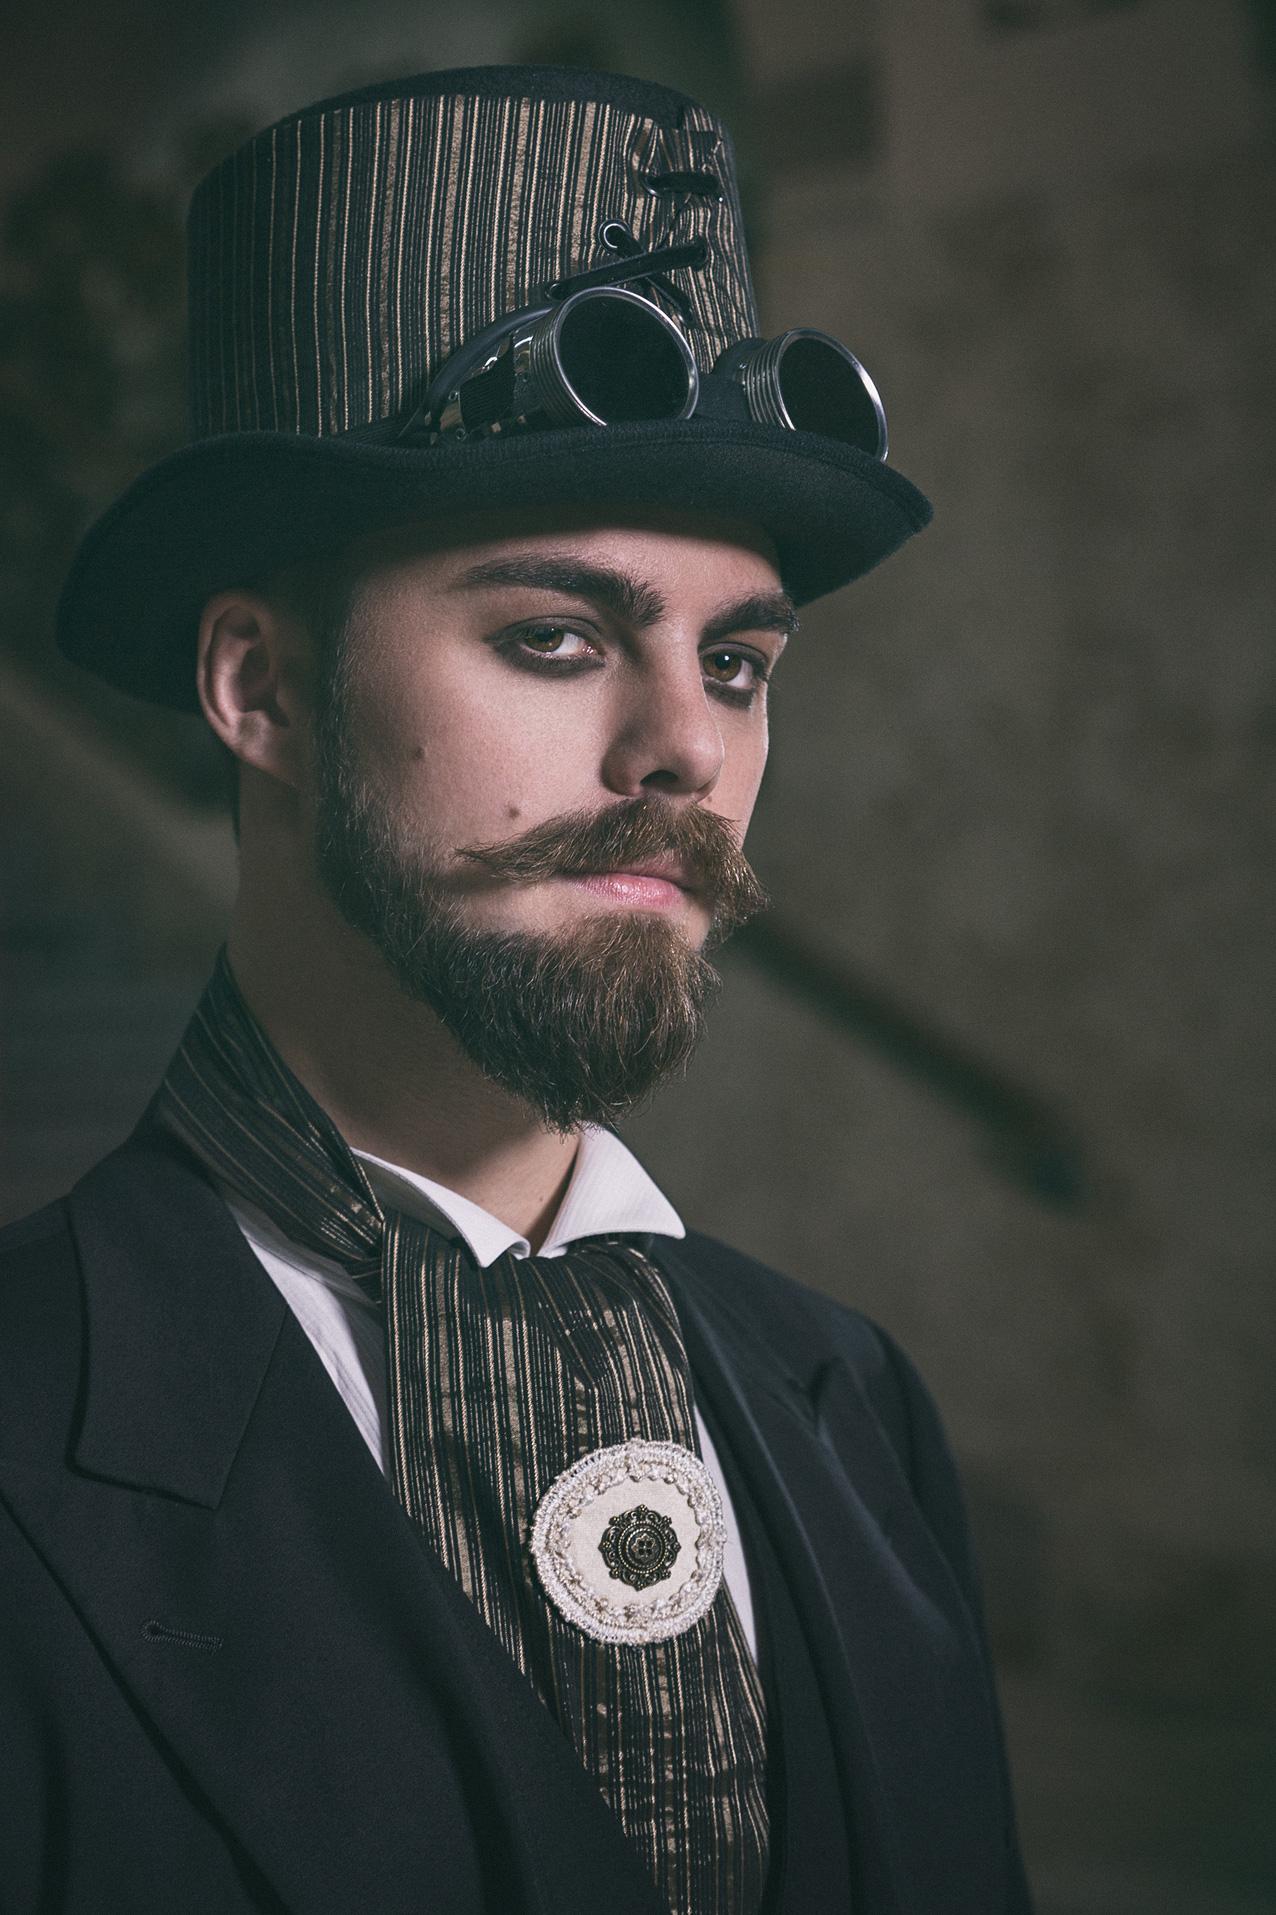 SteamPunk Shooting - Julian im Volksbad